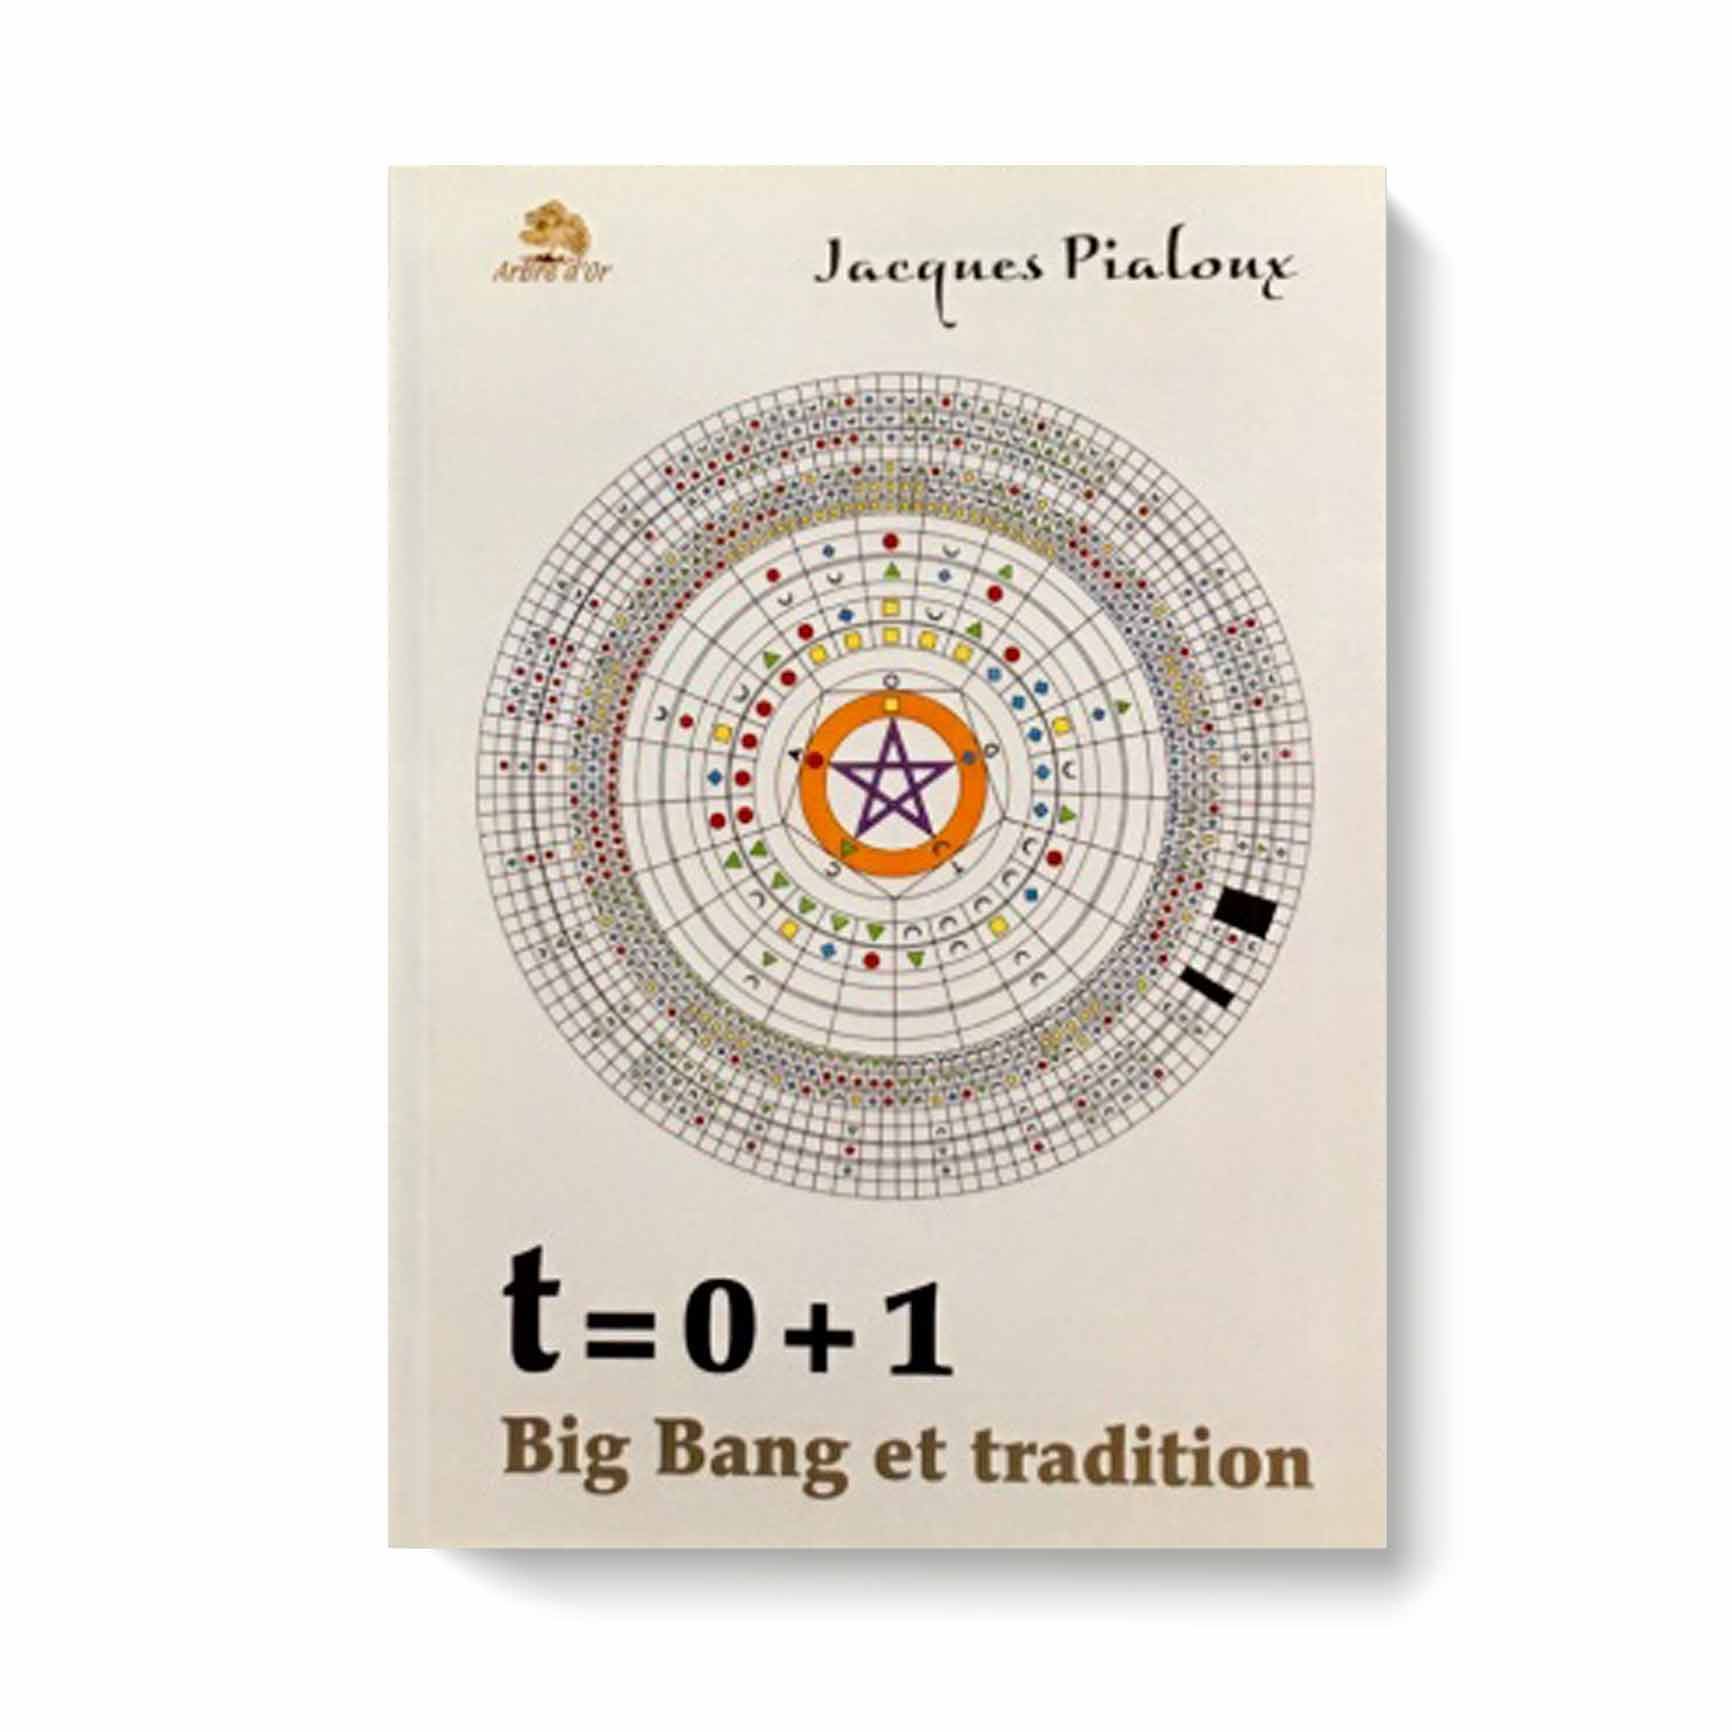 t=0+1 Big Bang et tradition